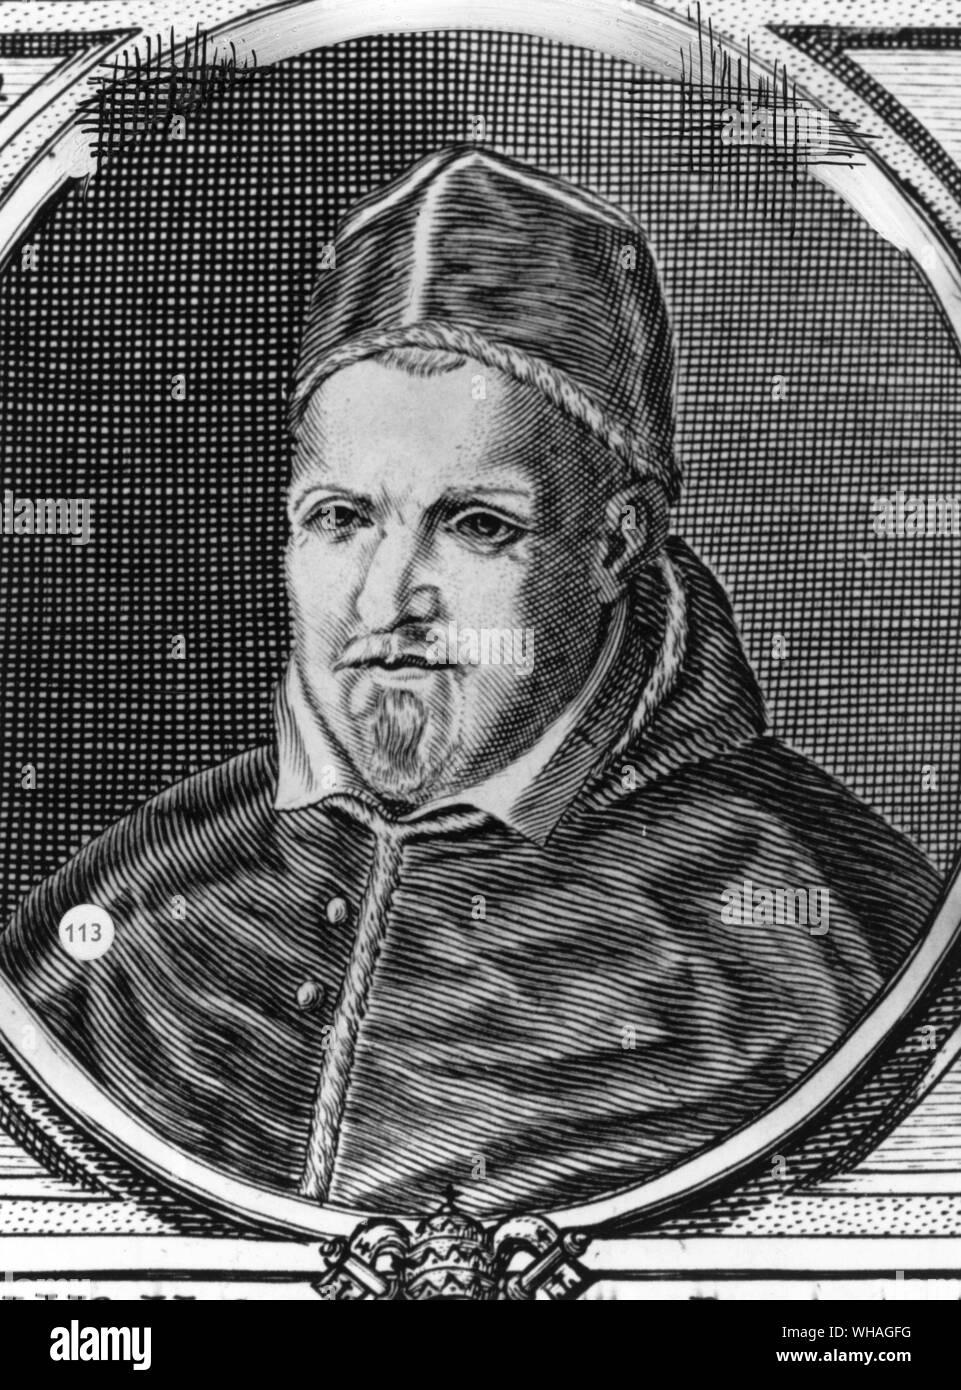 Pope Paul V. Paul V (orig. Camillo Borghese) Italian pope 1605-1621  1552-1621 . . Stock Photo